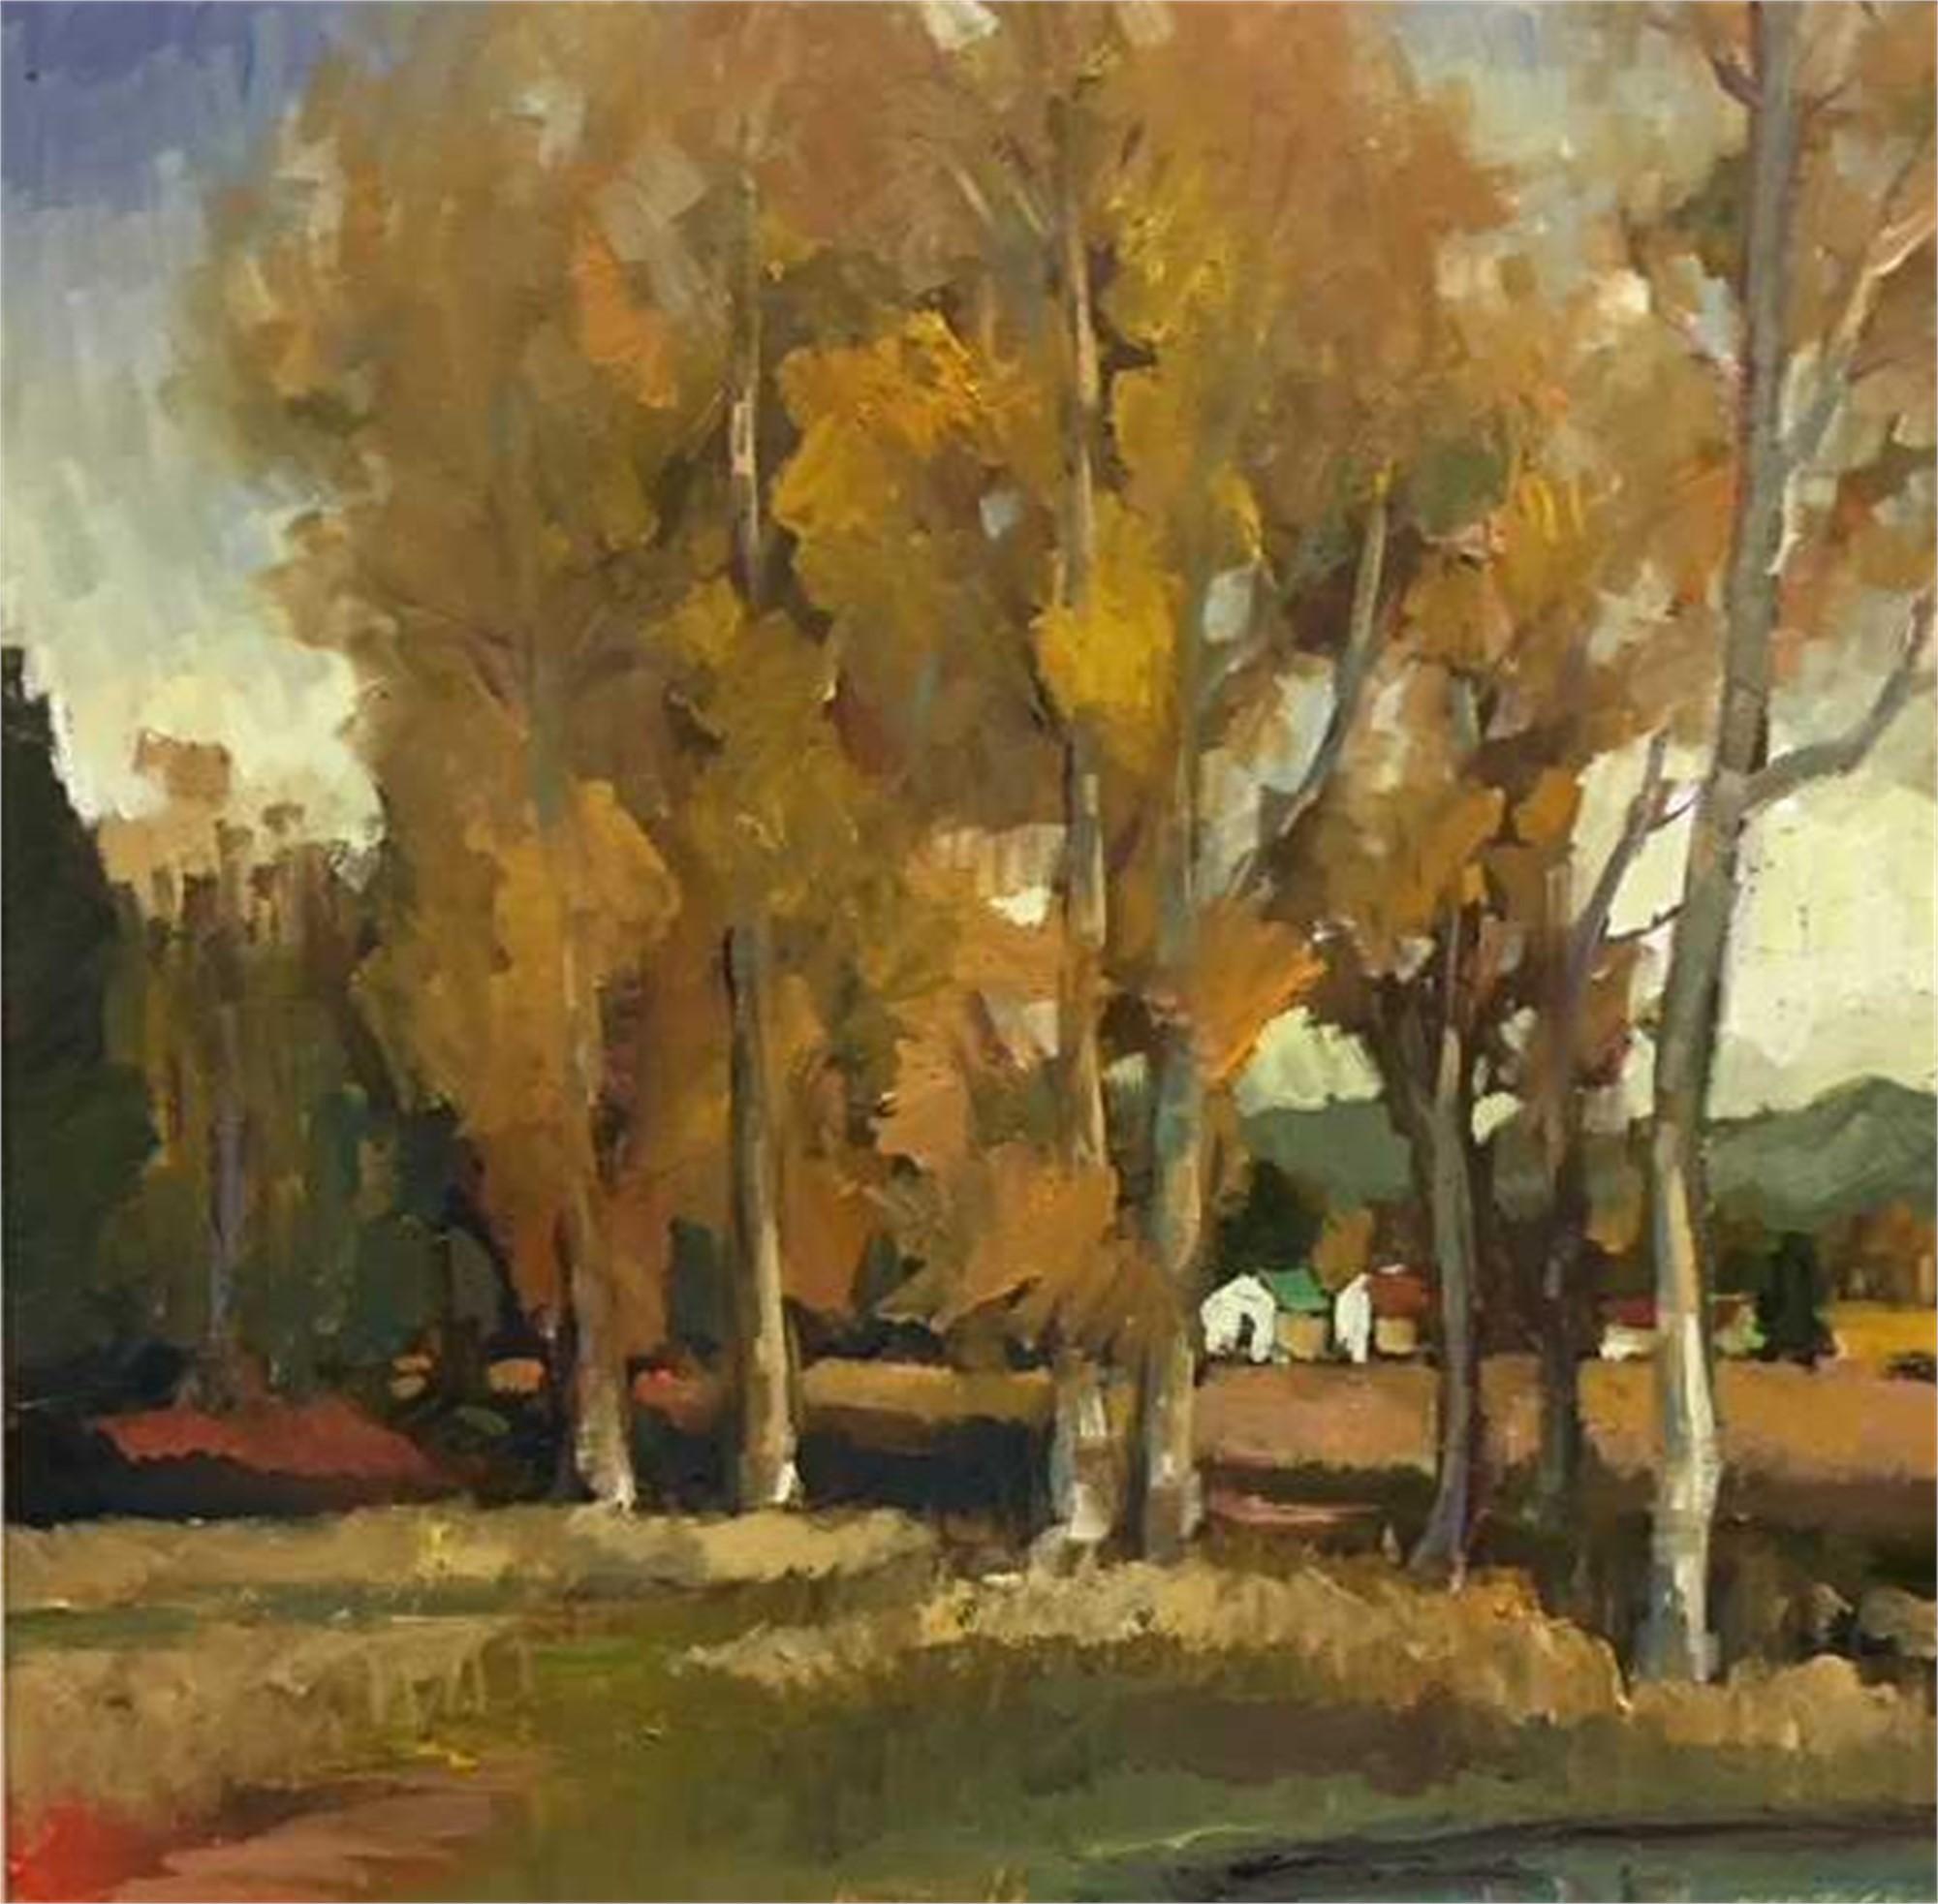 Ode to Autumn by Wen Ze Chen